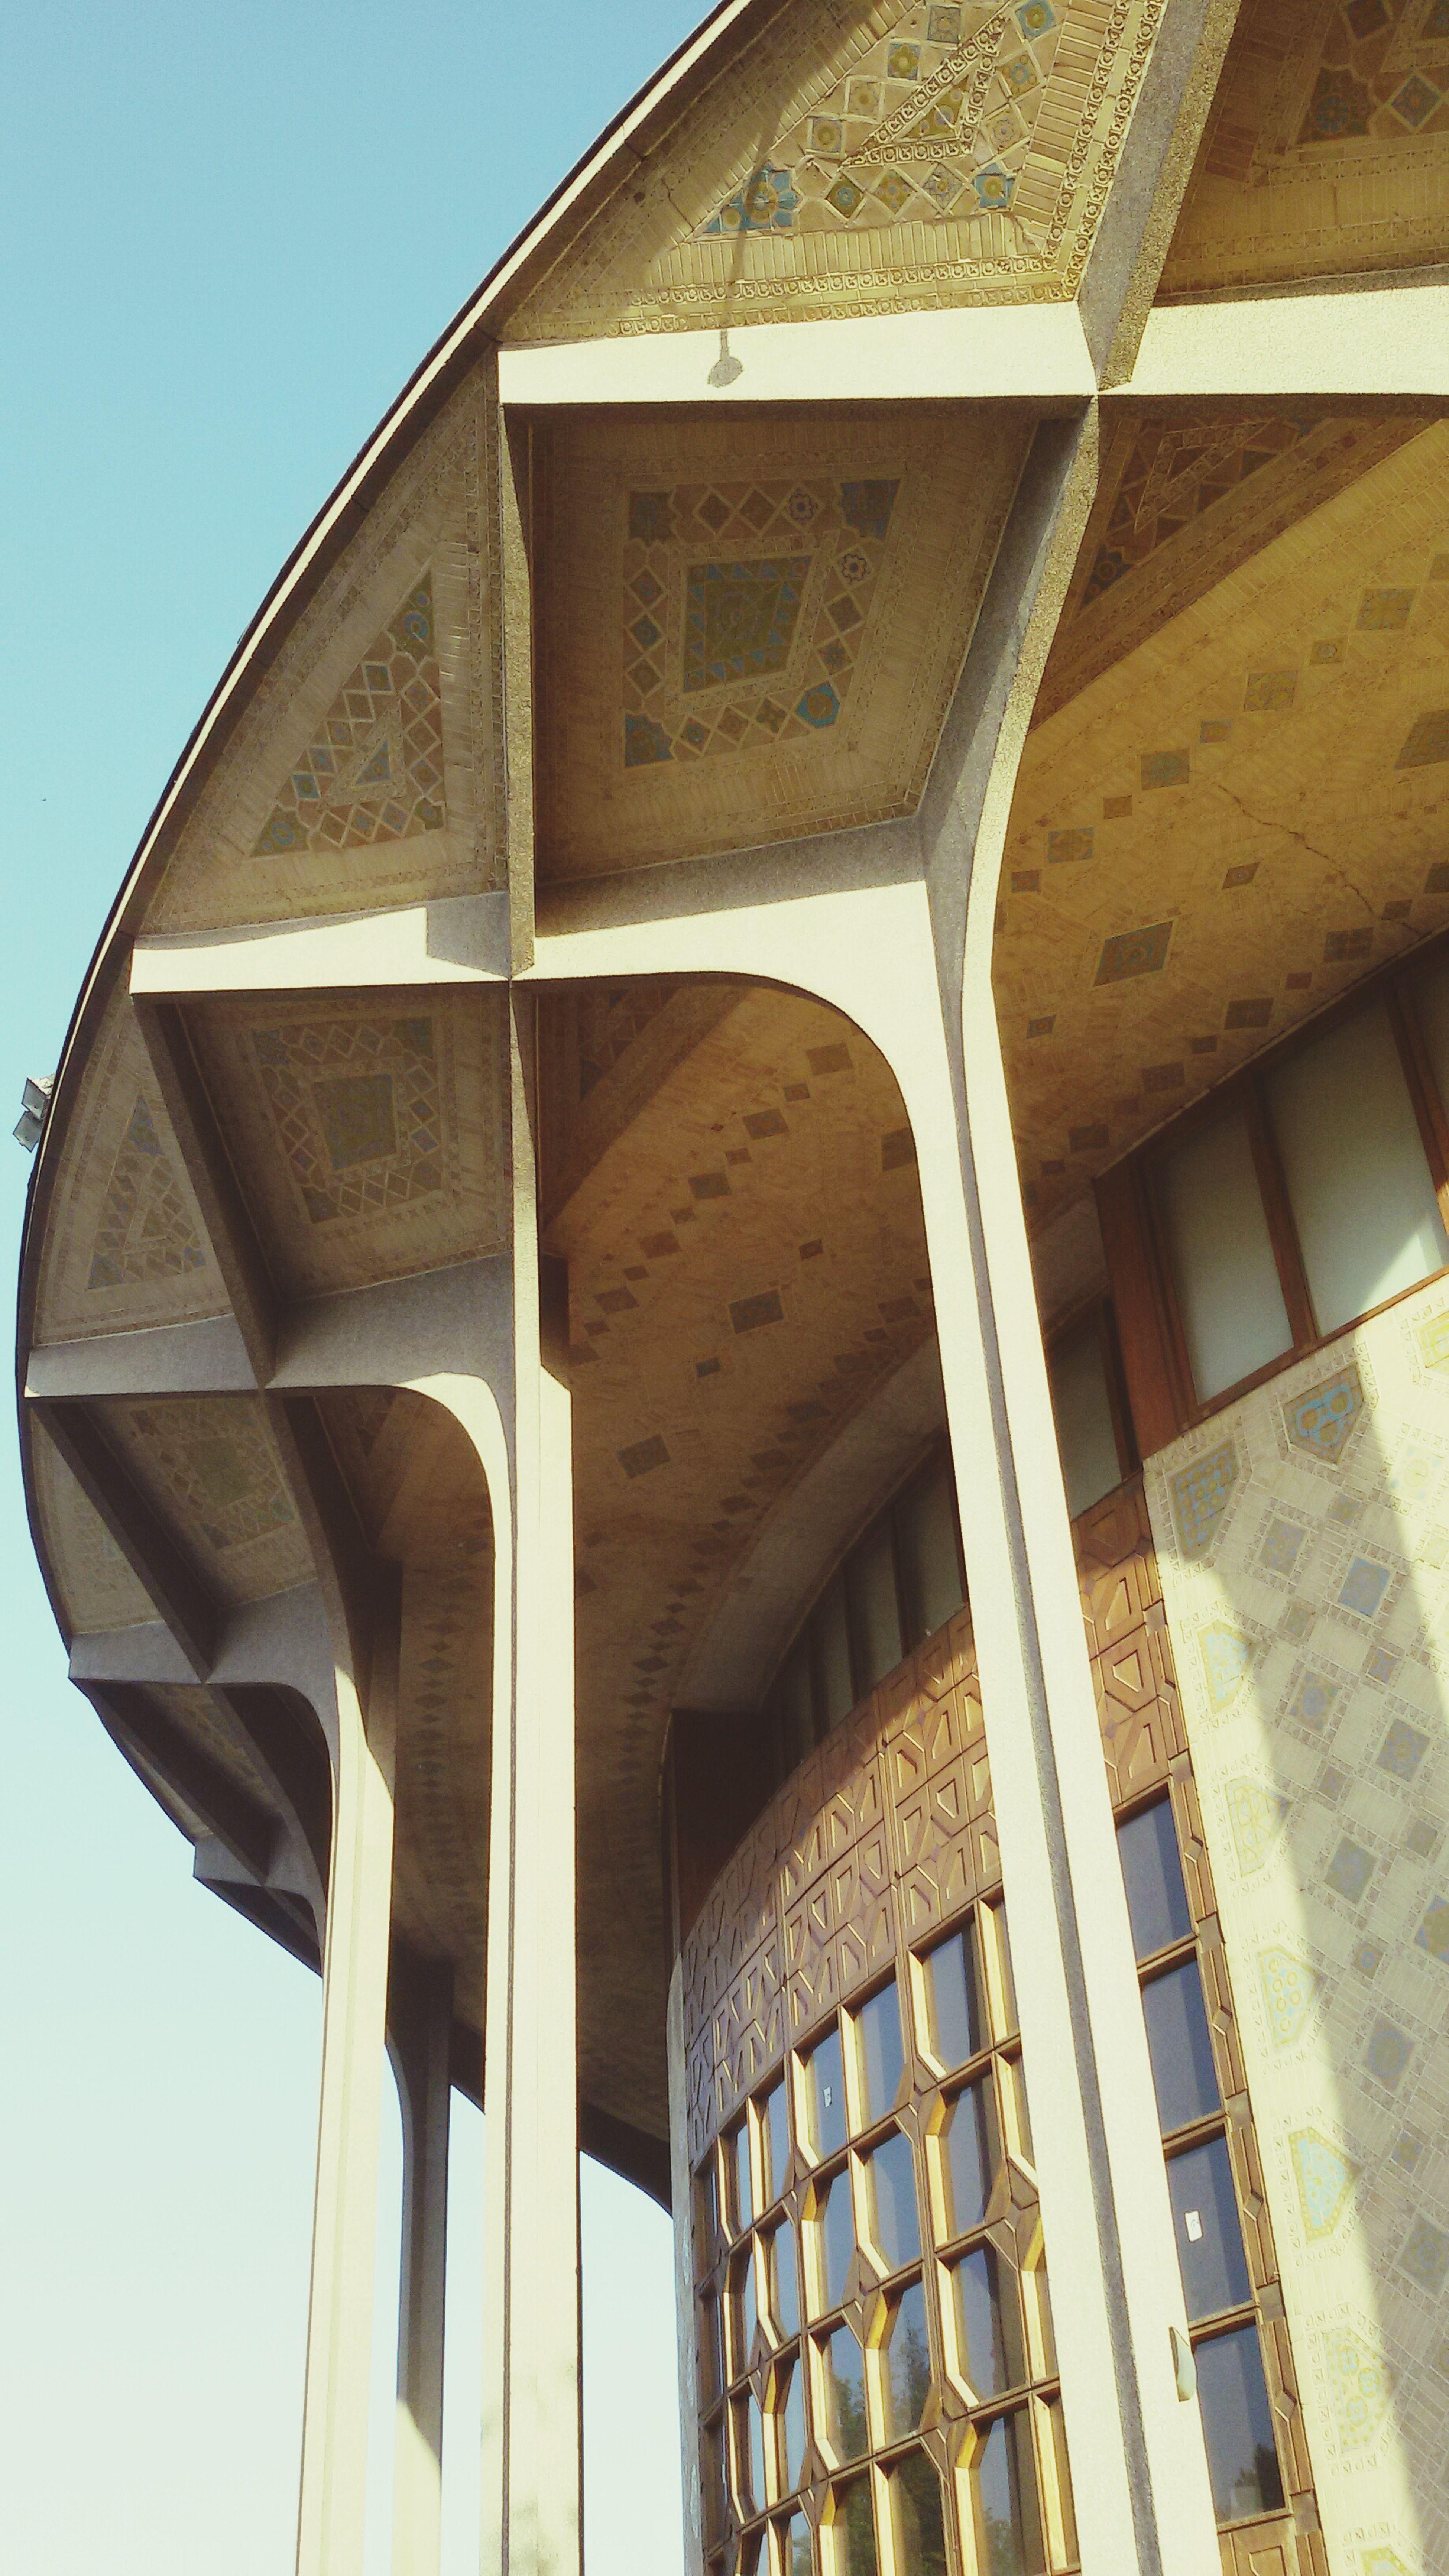 Tehran City theatre ... Tehran Tehran, Iran First Eyeem Photo Thearchitect-2016-eyeemawards ILoveMyCity Iran Comeandseeiran The Architect - 2016 EyeEm Awards